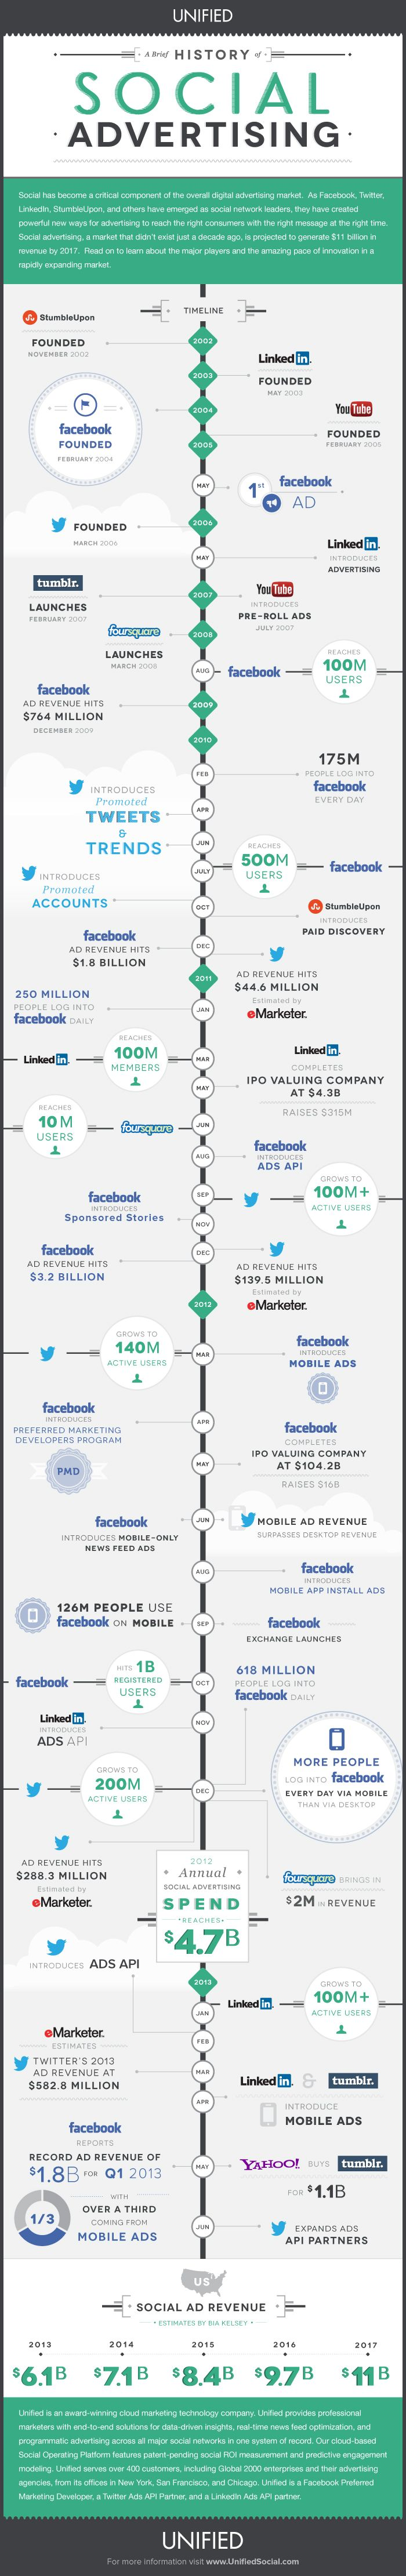 A Brief History Of Social Advertising #Infographic #SocialMedia #Advertising